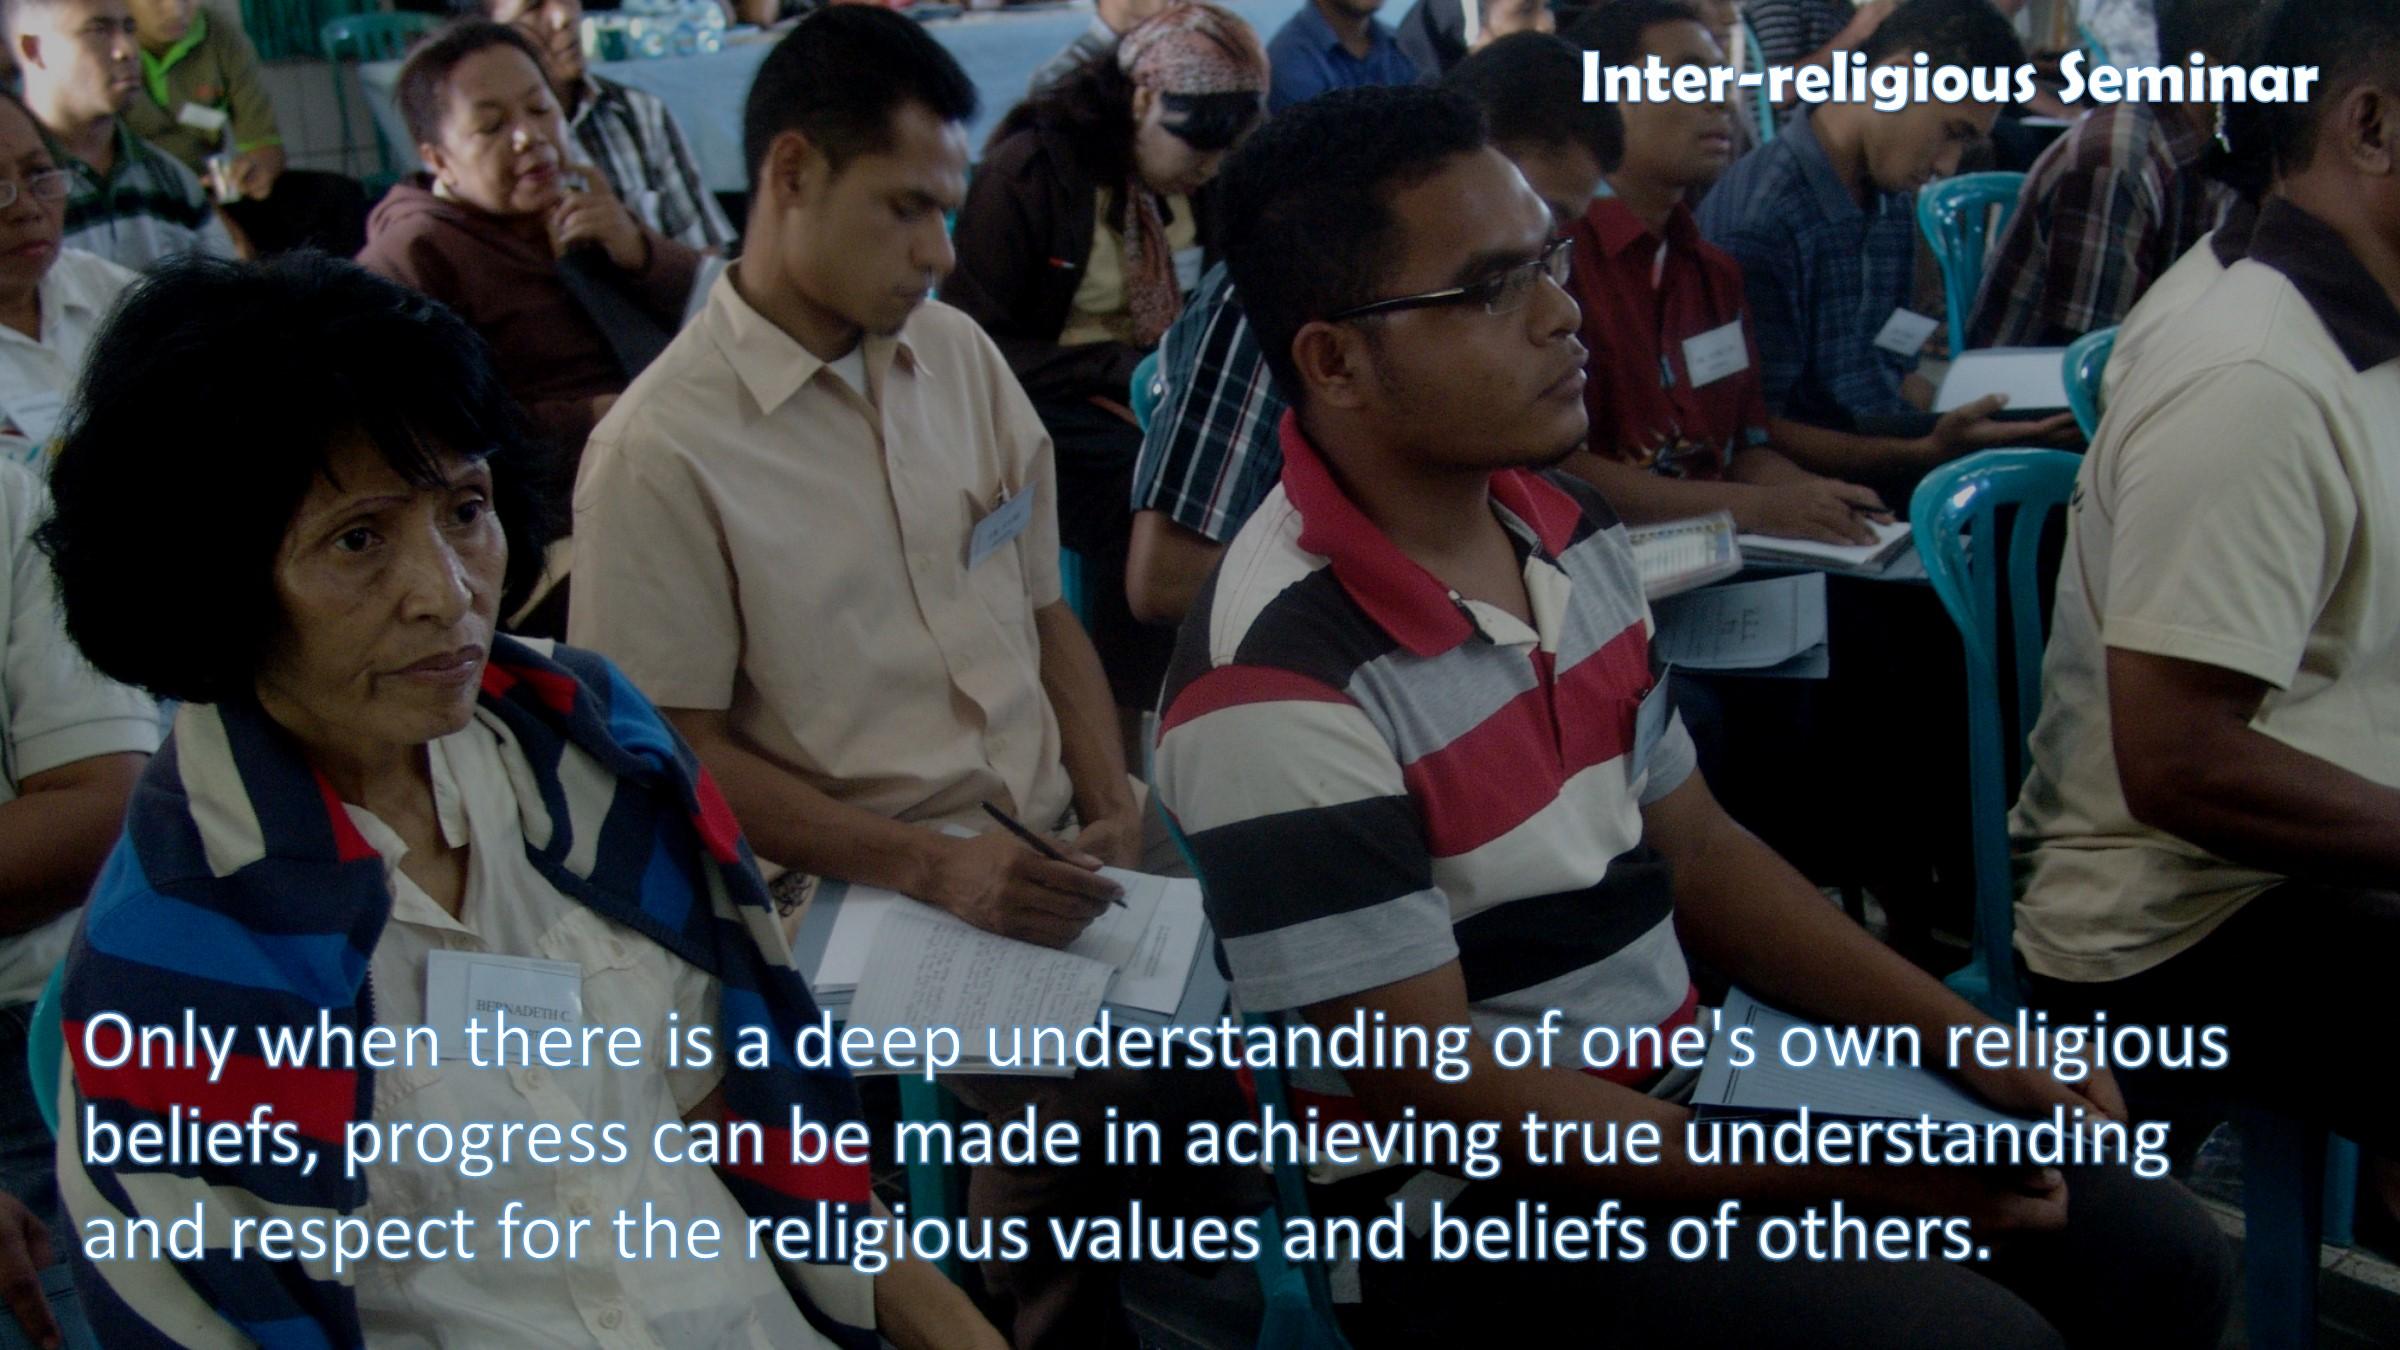 Inter-religious Seminar